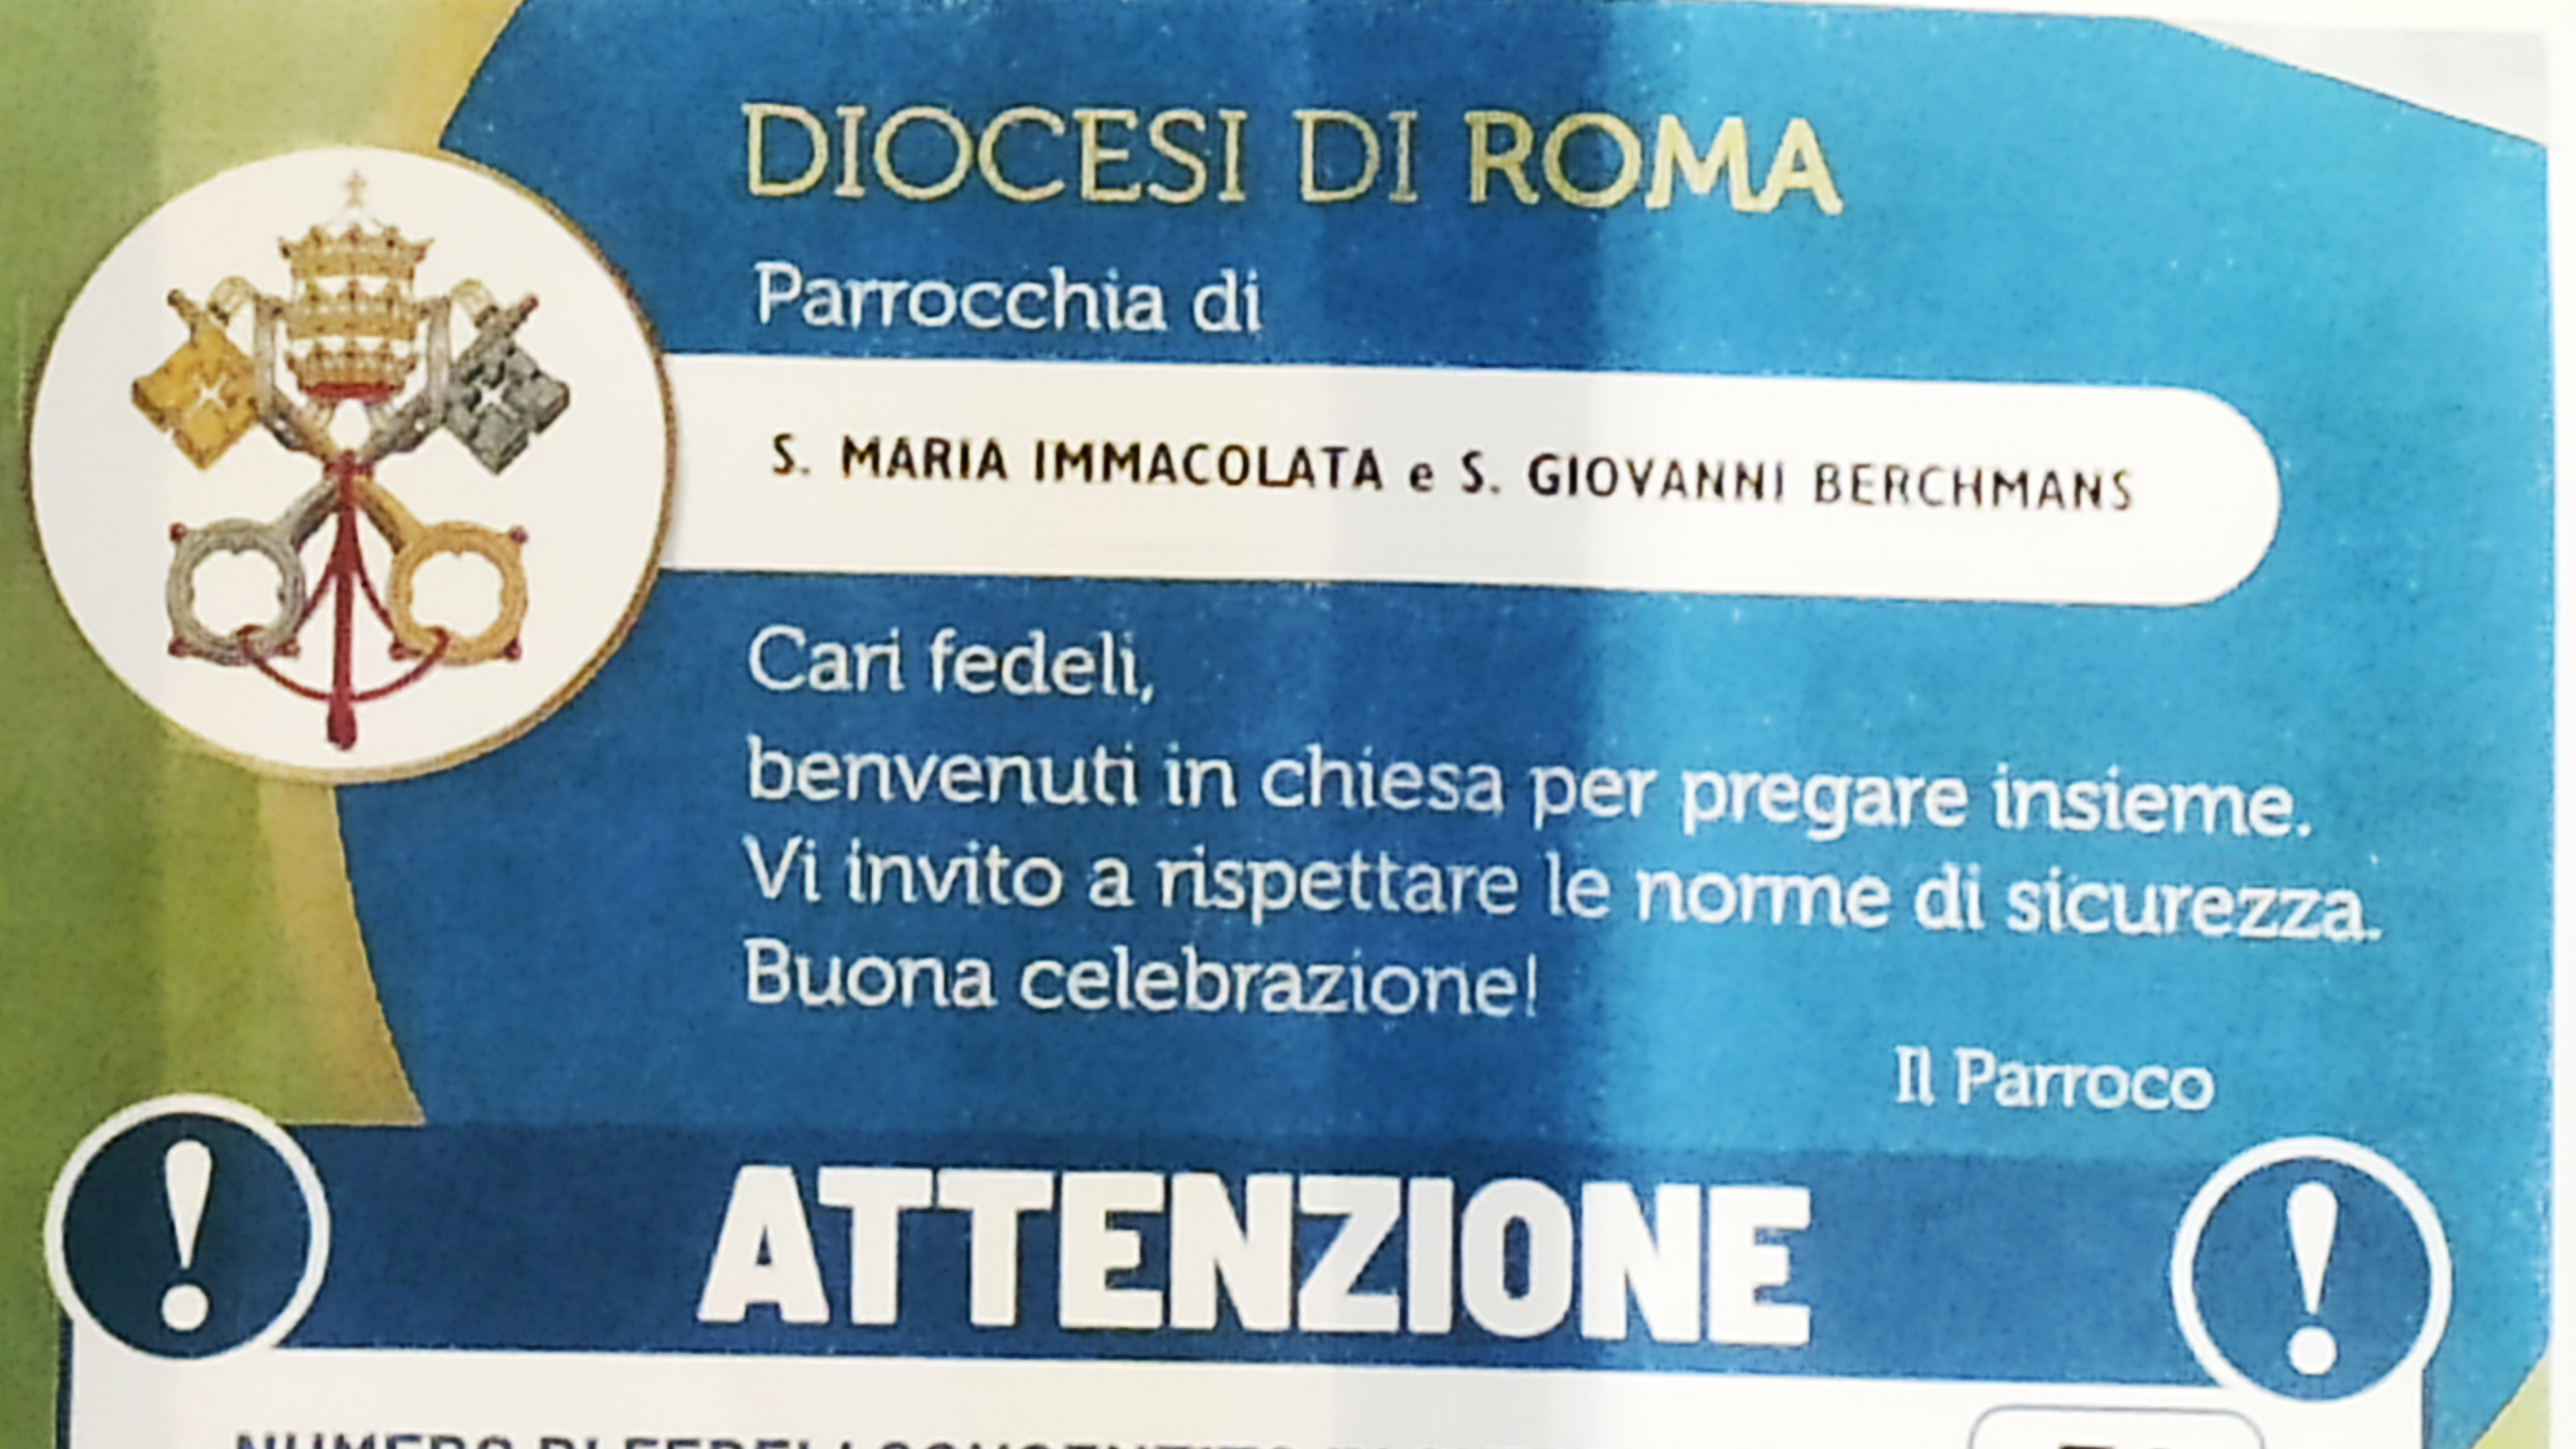 Anti-Church of Rome: Catholics forbidden to attend the Virus Mass